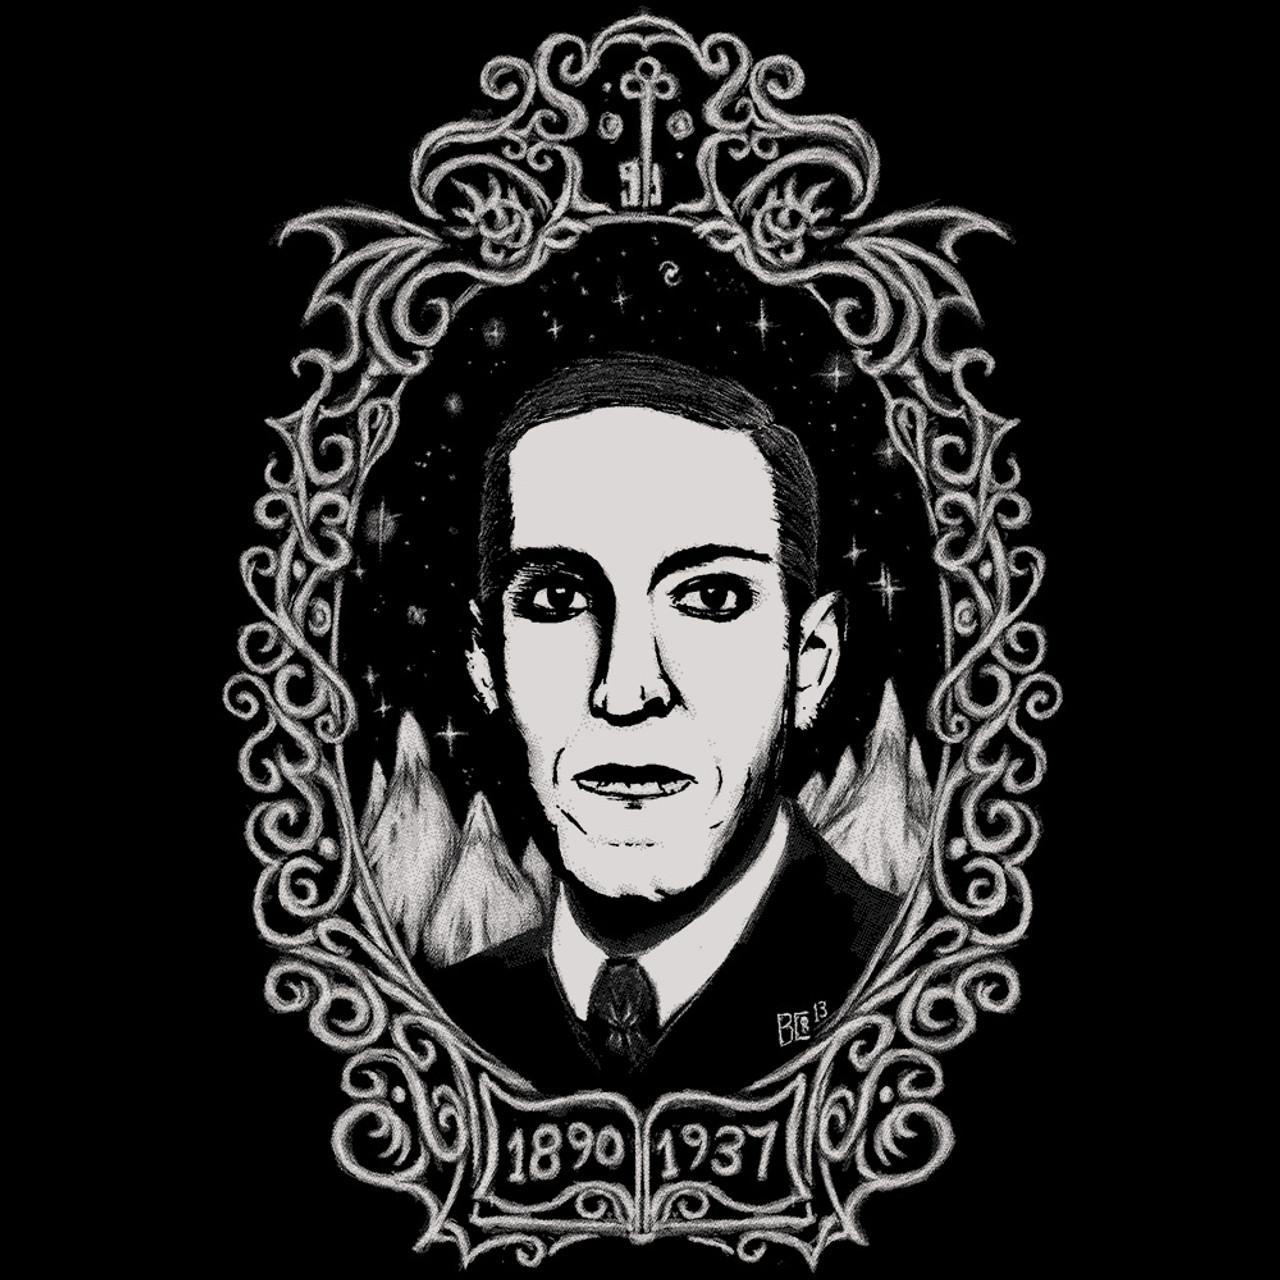 H P  Lovecraft Oval Portrait shirt